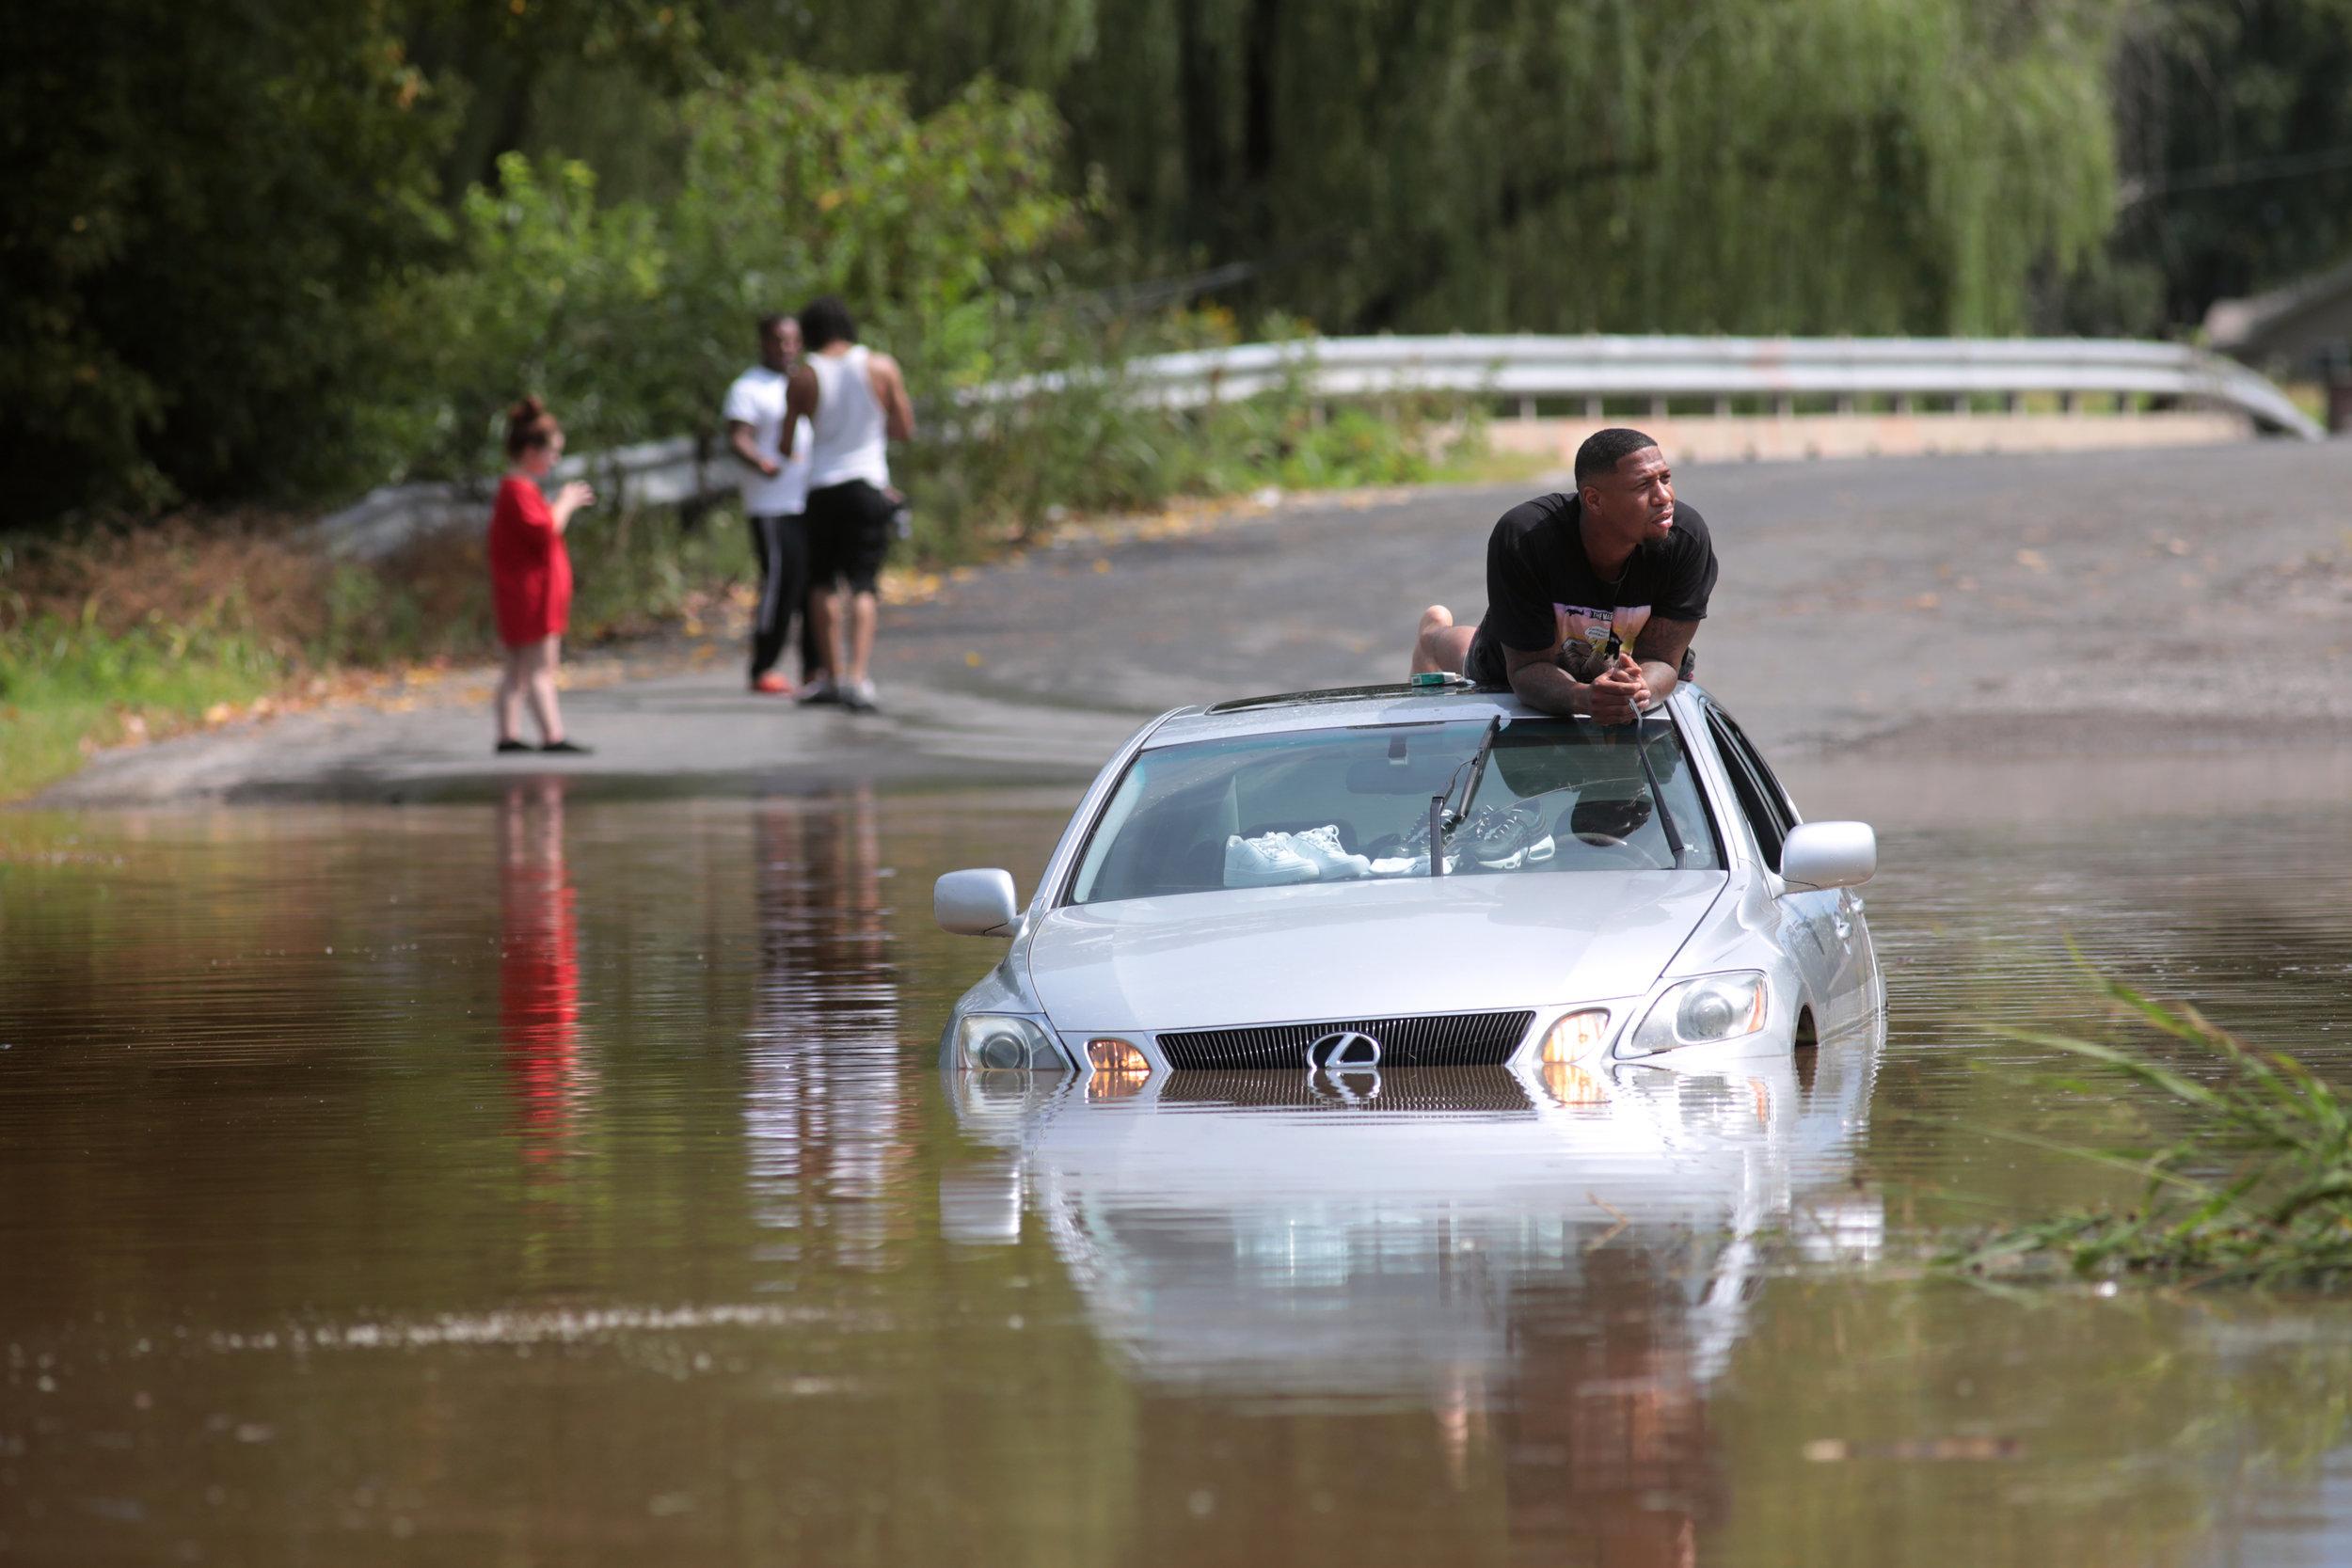 190812 CF flooding 01.jpg